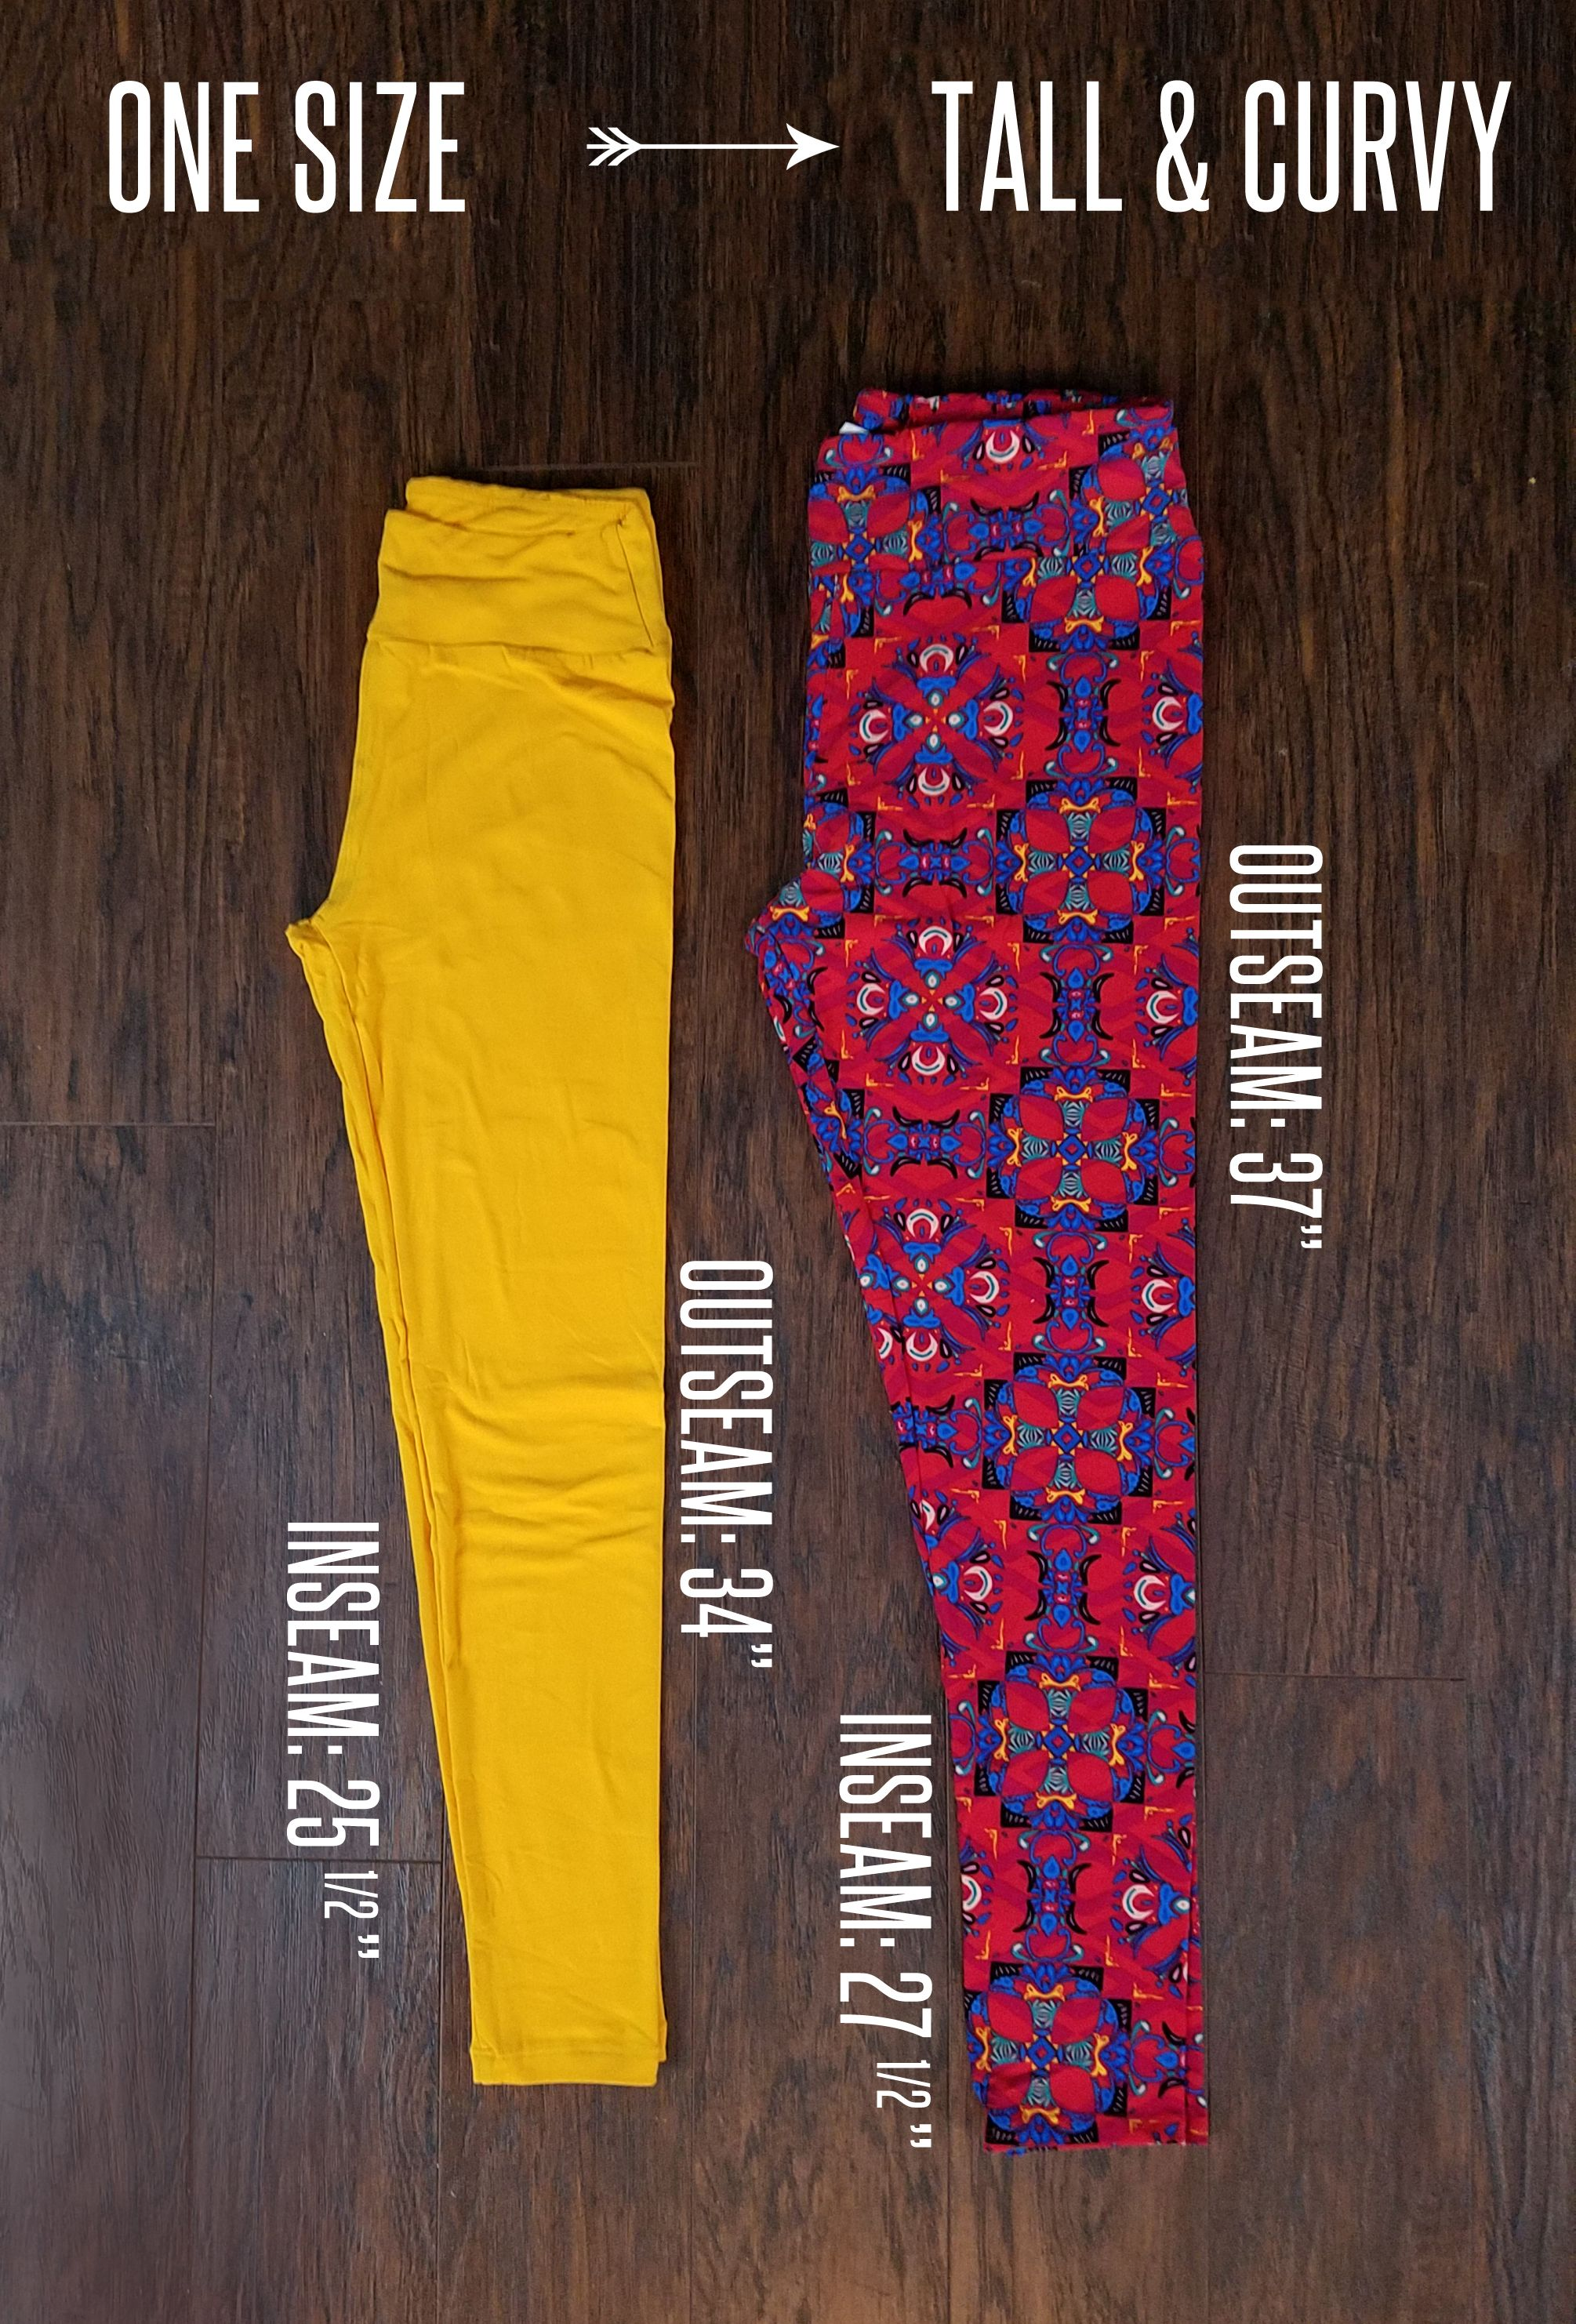 Lularoe Legging Lengths Lularoe Pinterest Lula Roe Business And Clothes